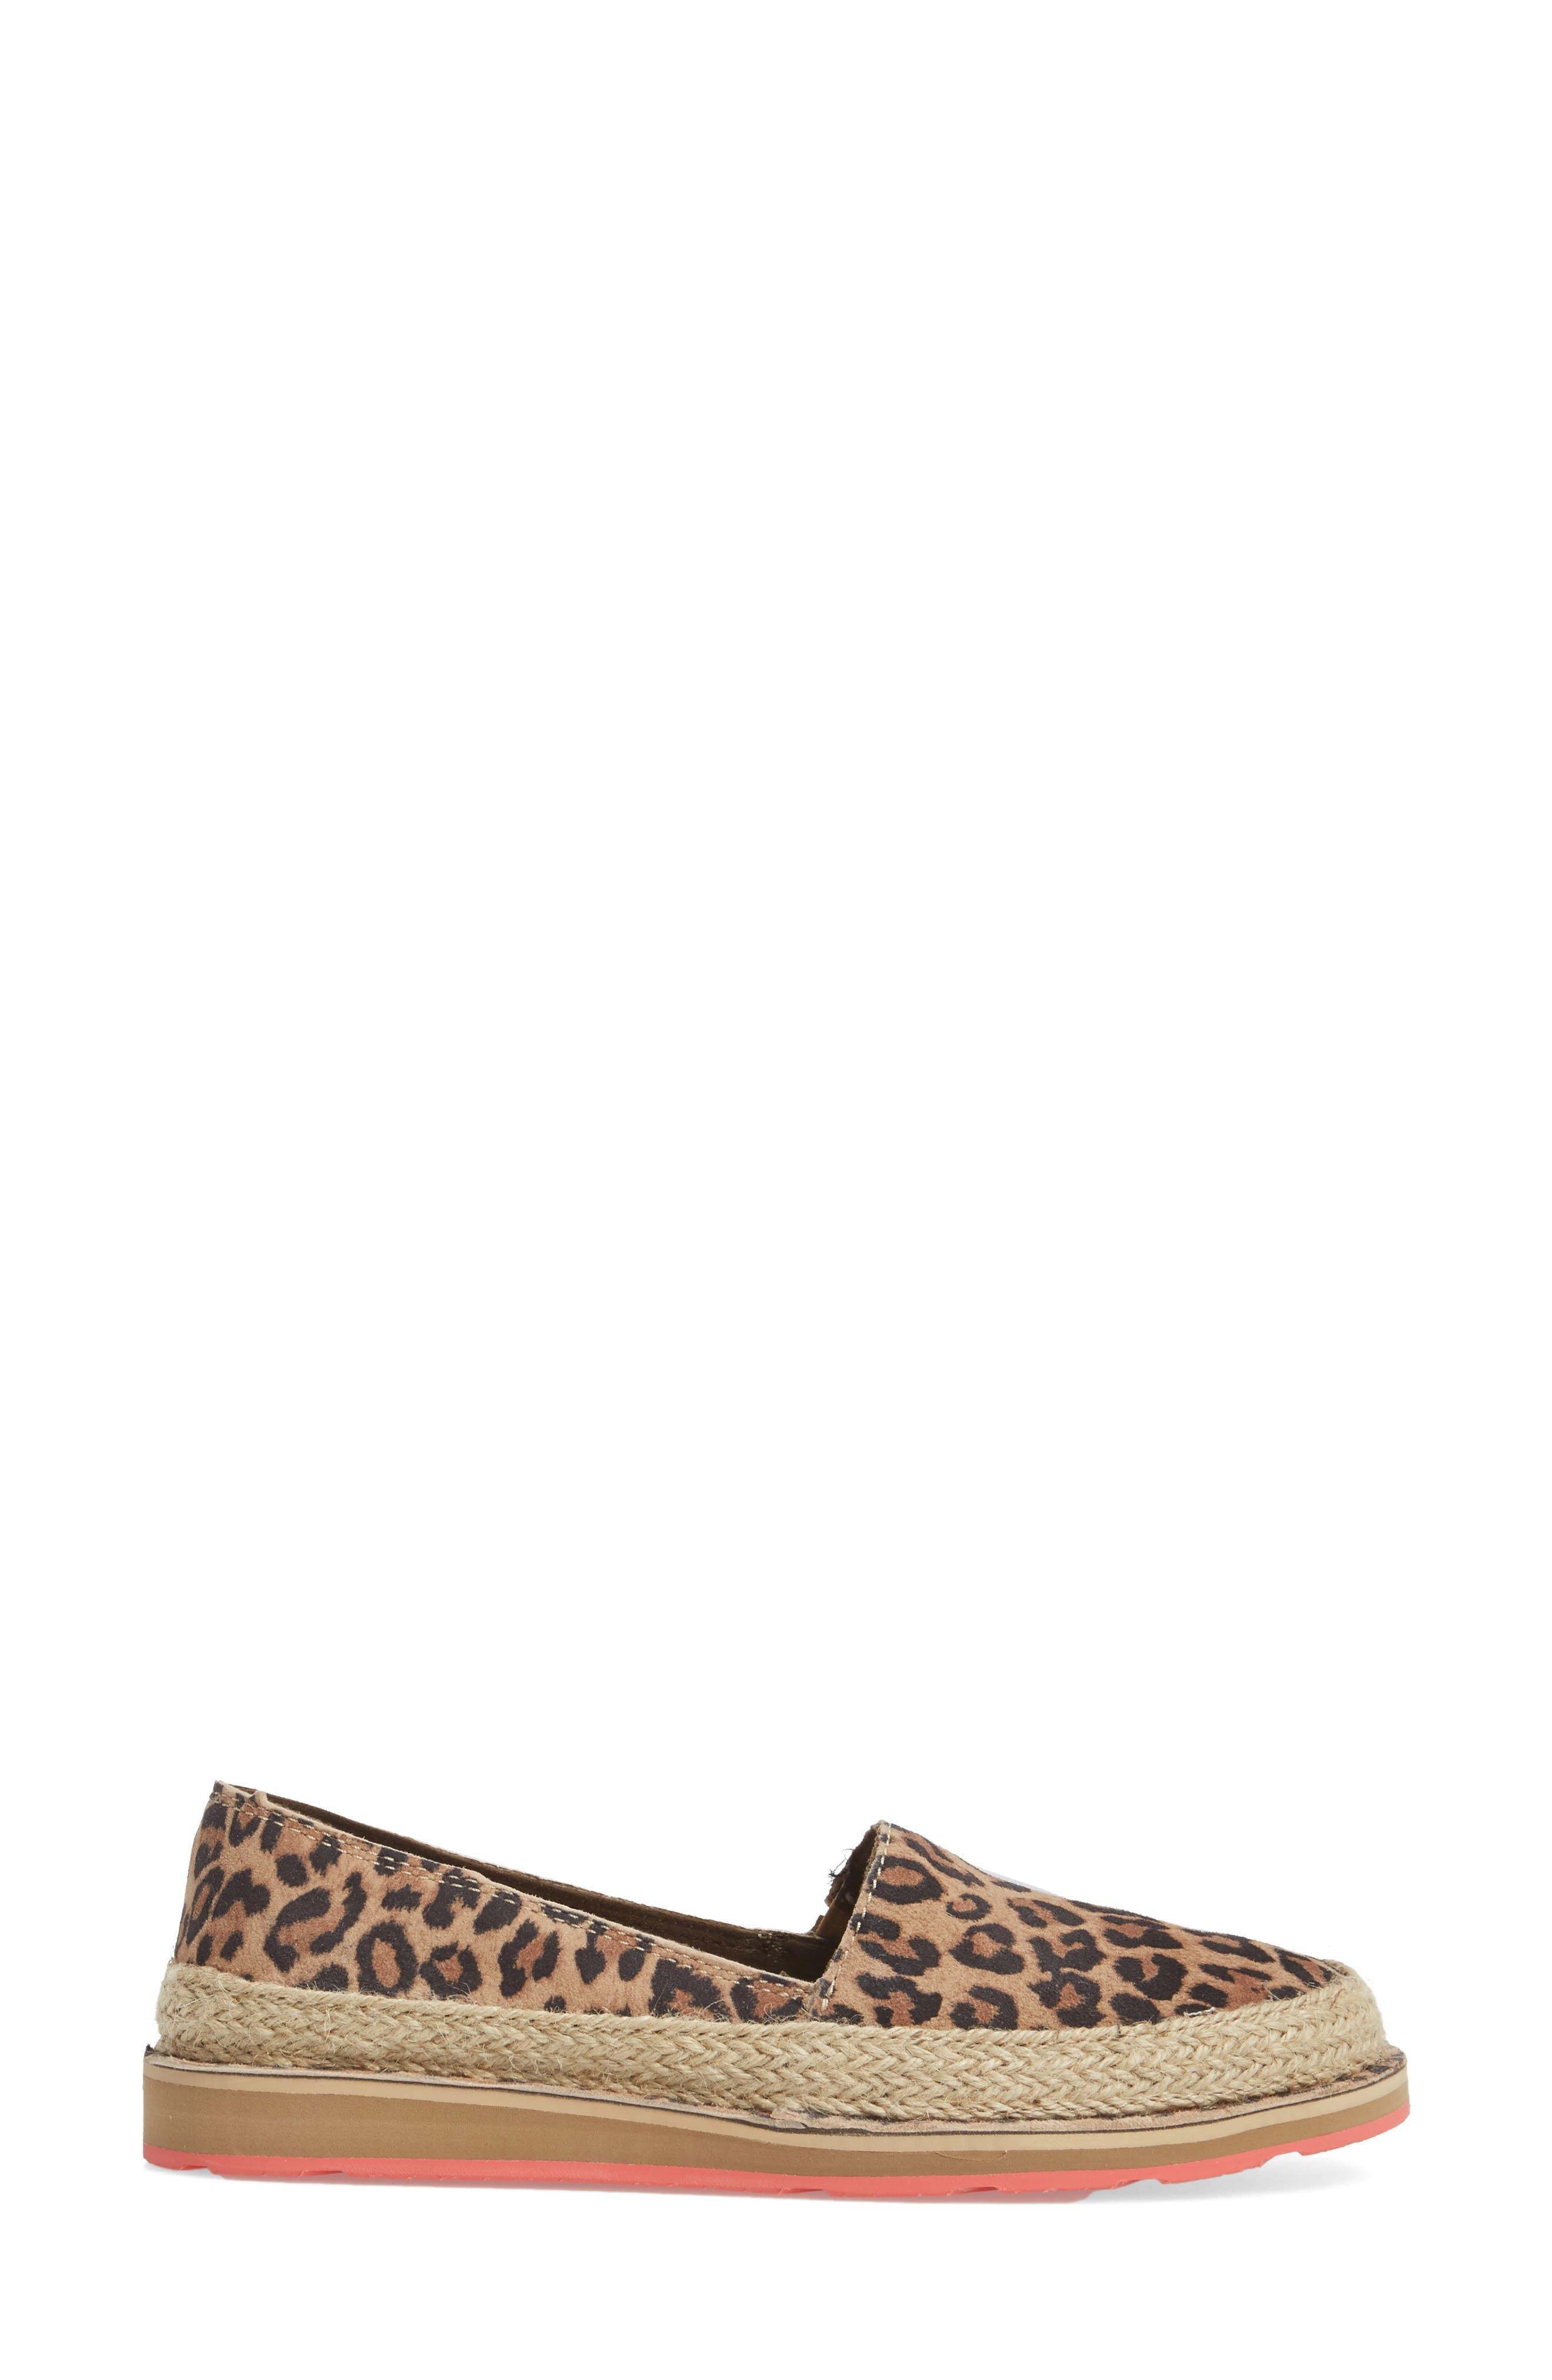 Alternate Image 3  - Ariat Cruiser Espadrille Loafer (Women)